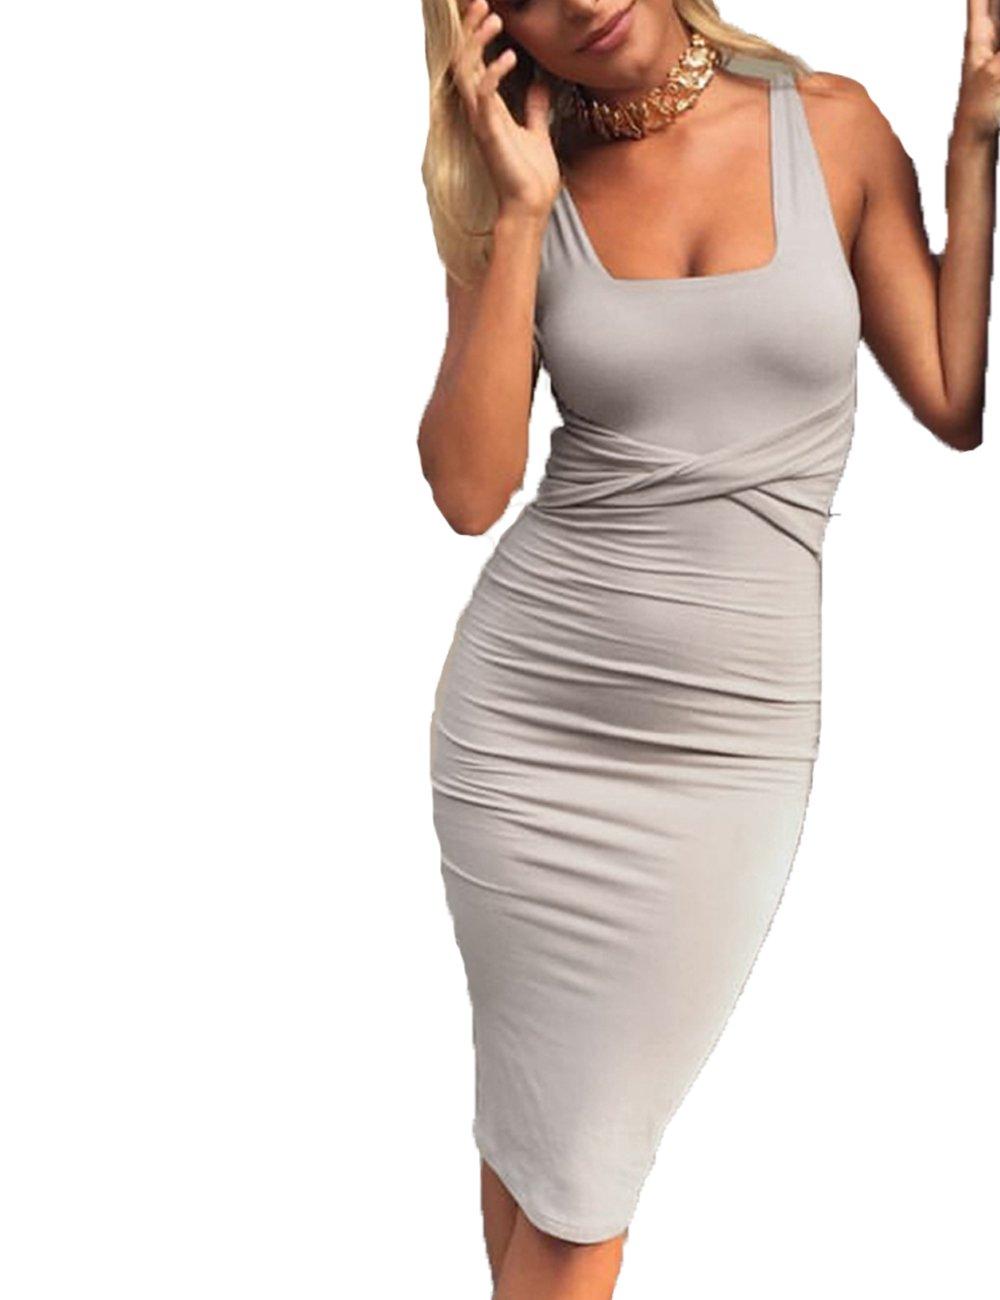 Available at Amazon: UZZDSS Sexy Sleeveless Velvet Warm Stretchy Cross Criss Tank Black Dark Blue Gray White Bodycon Bandage Dress